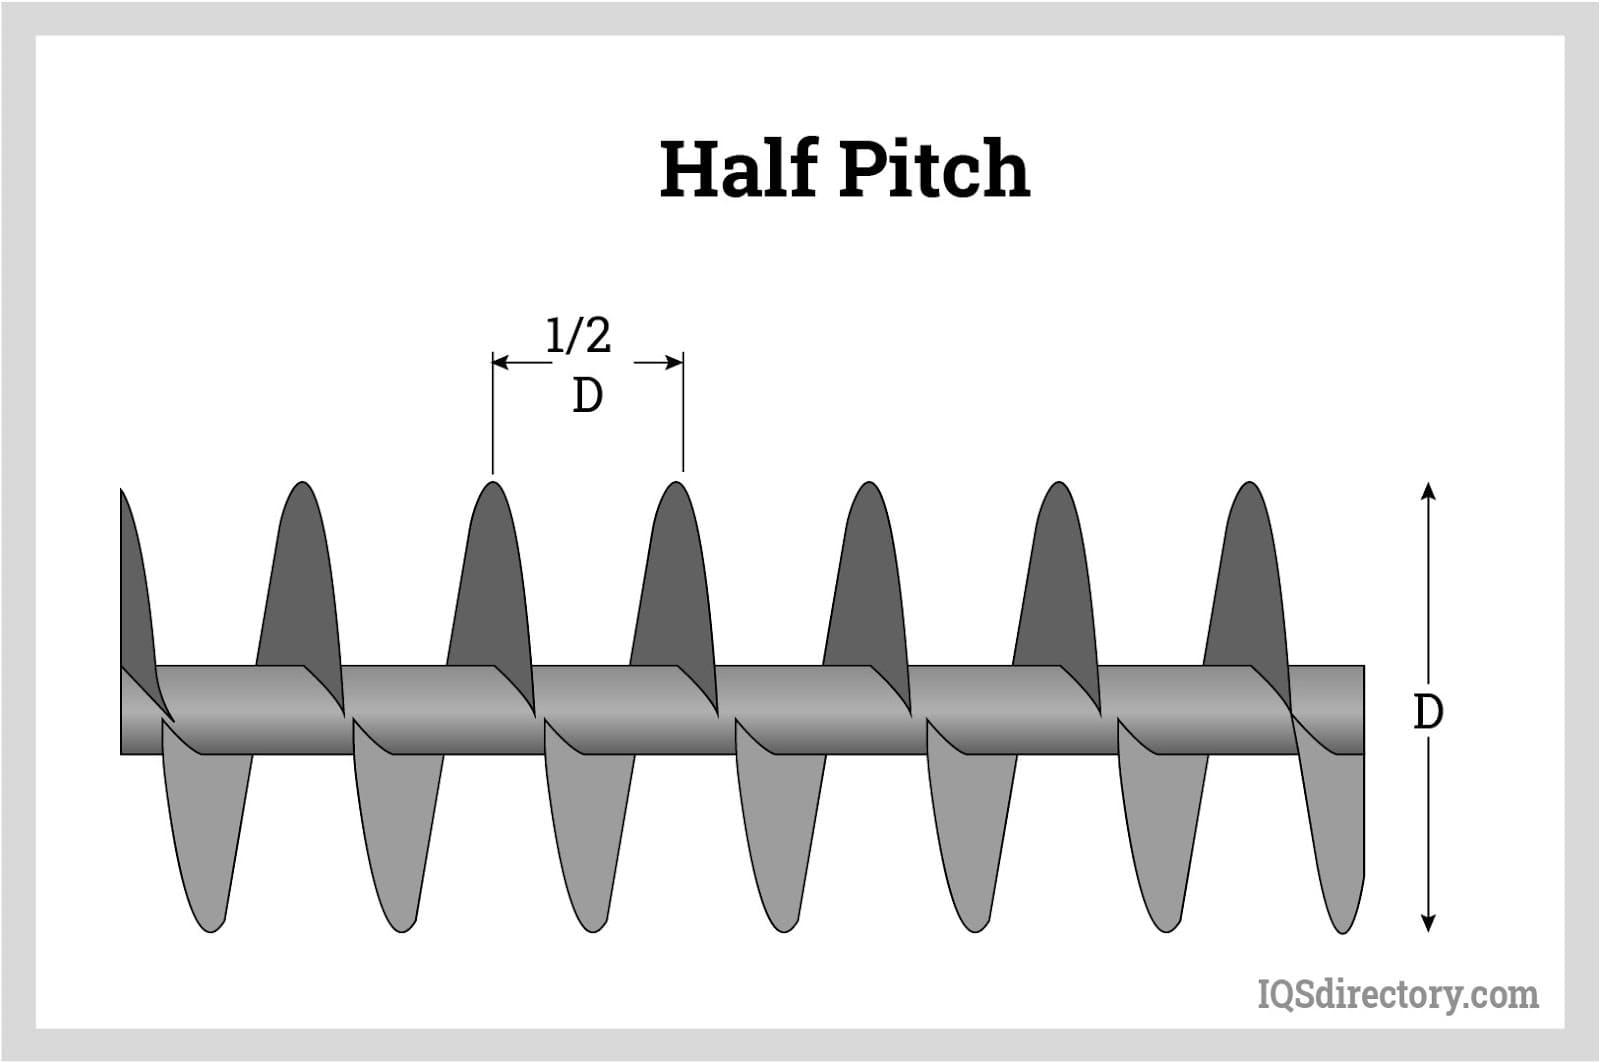 Half Pitch